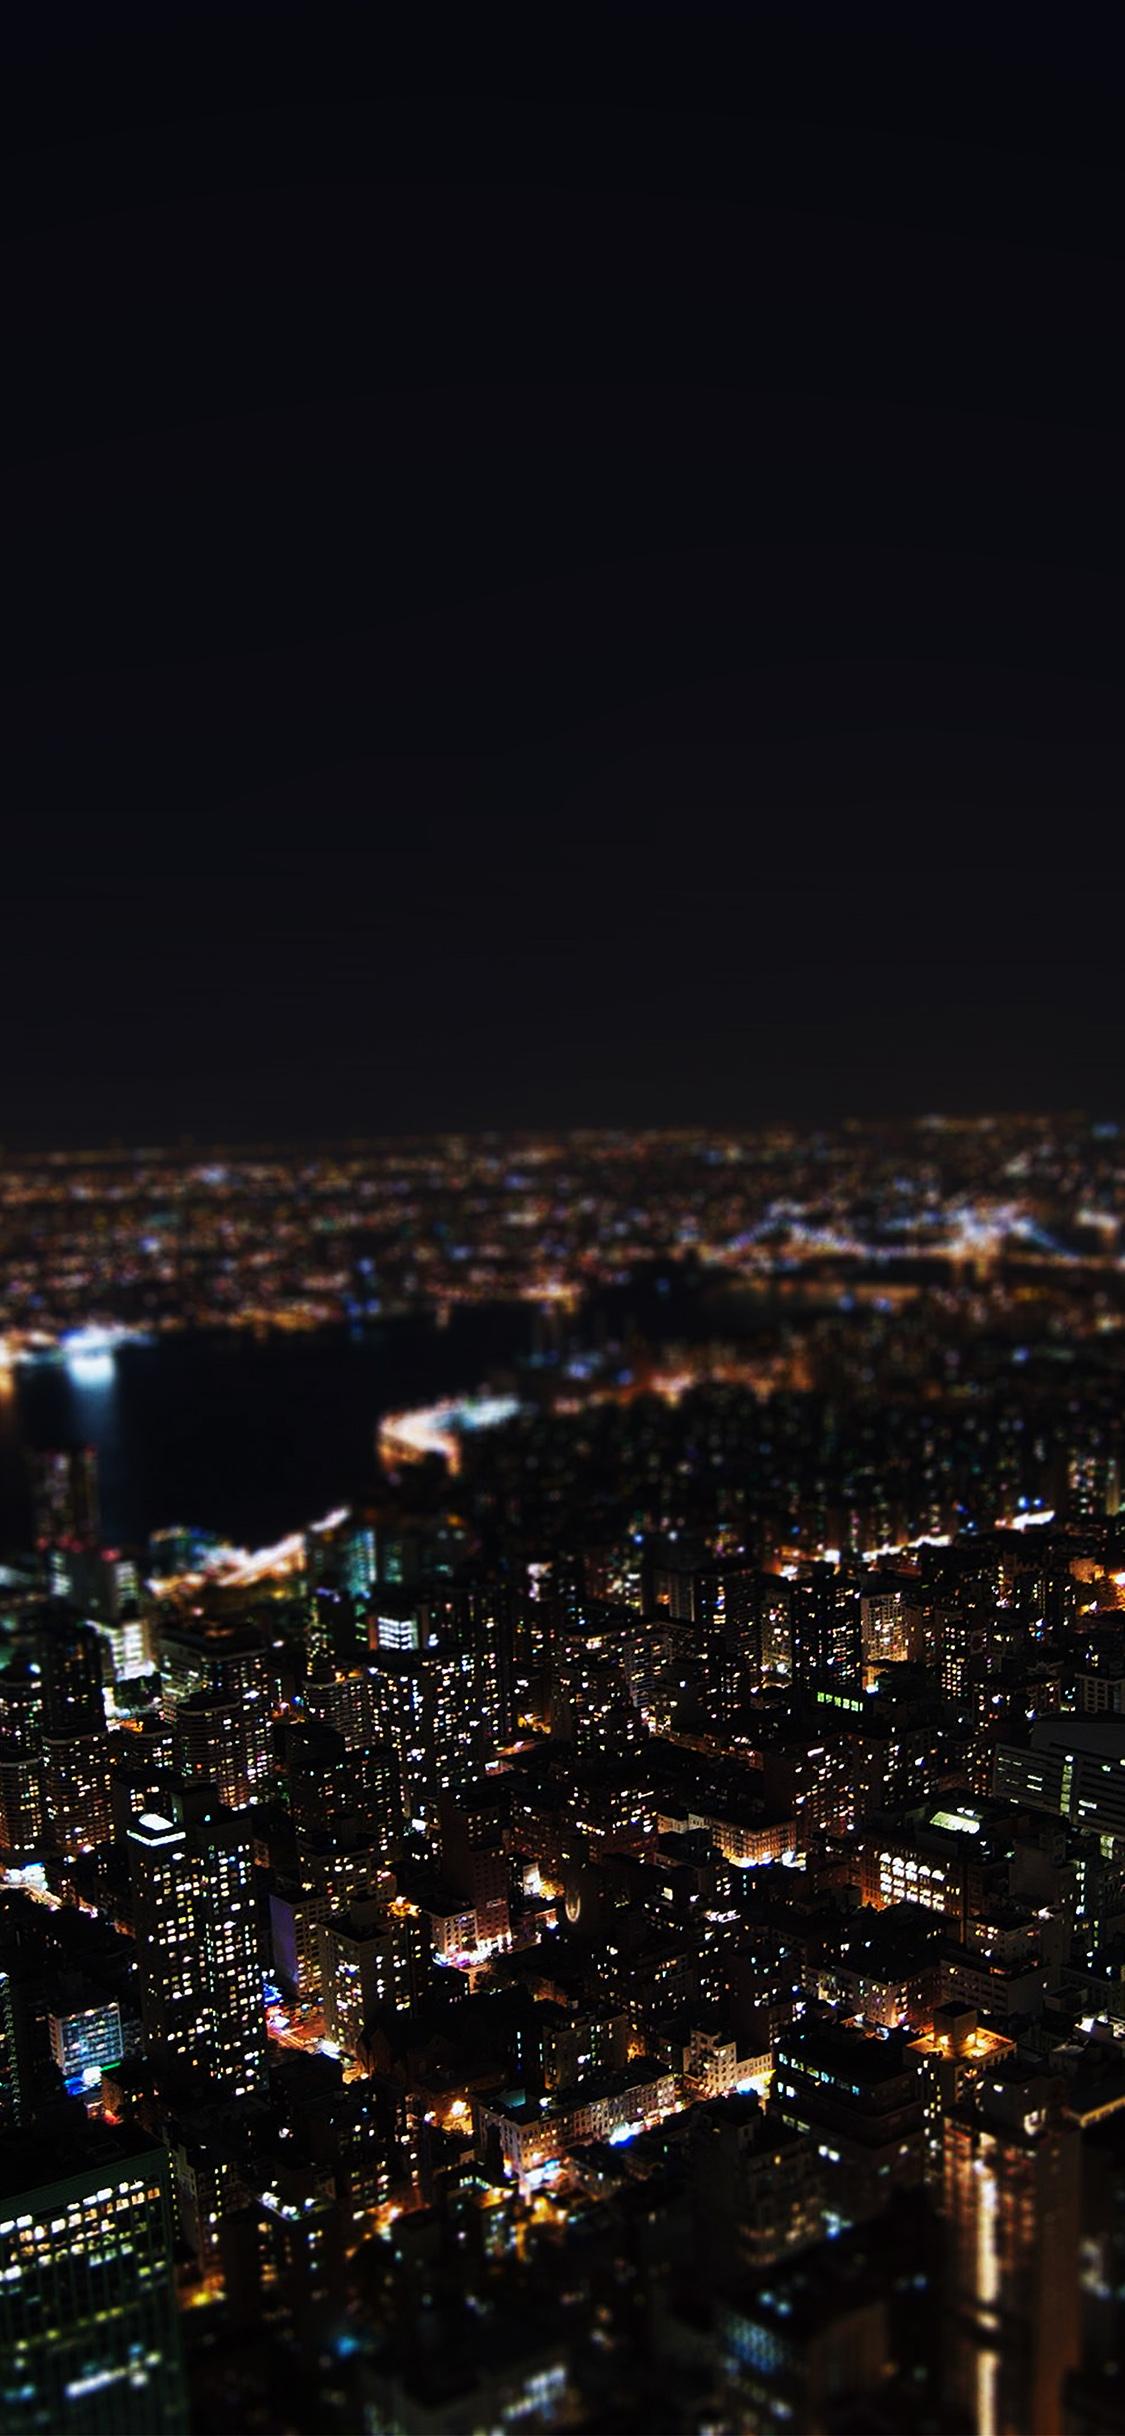 iPhoneXpapers.com-Apple-iPhone-wallpaper-mr01-dark-night-city-building-skyview